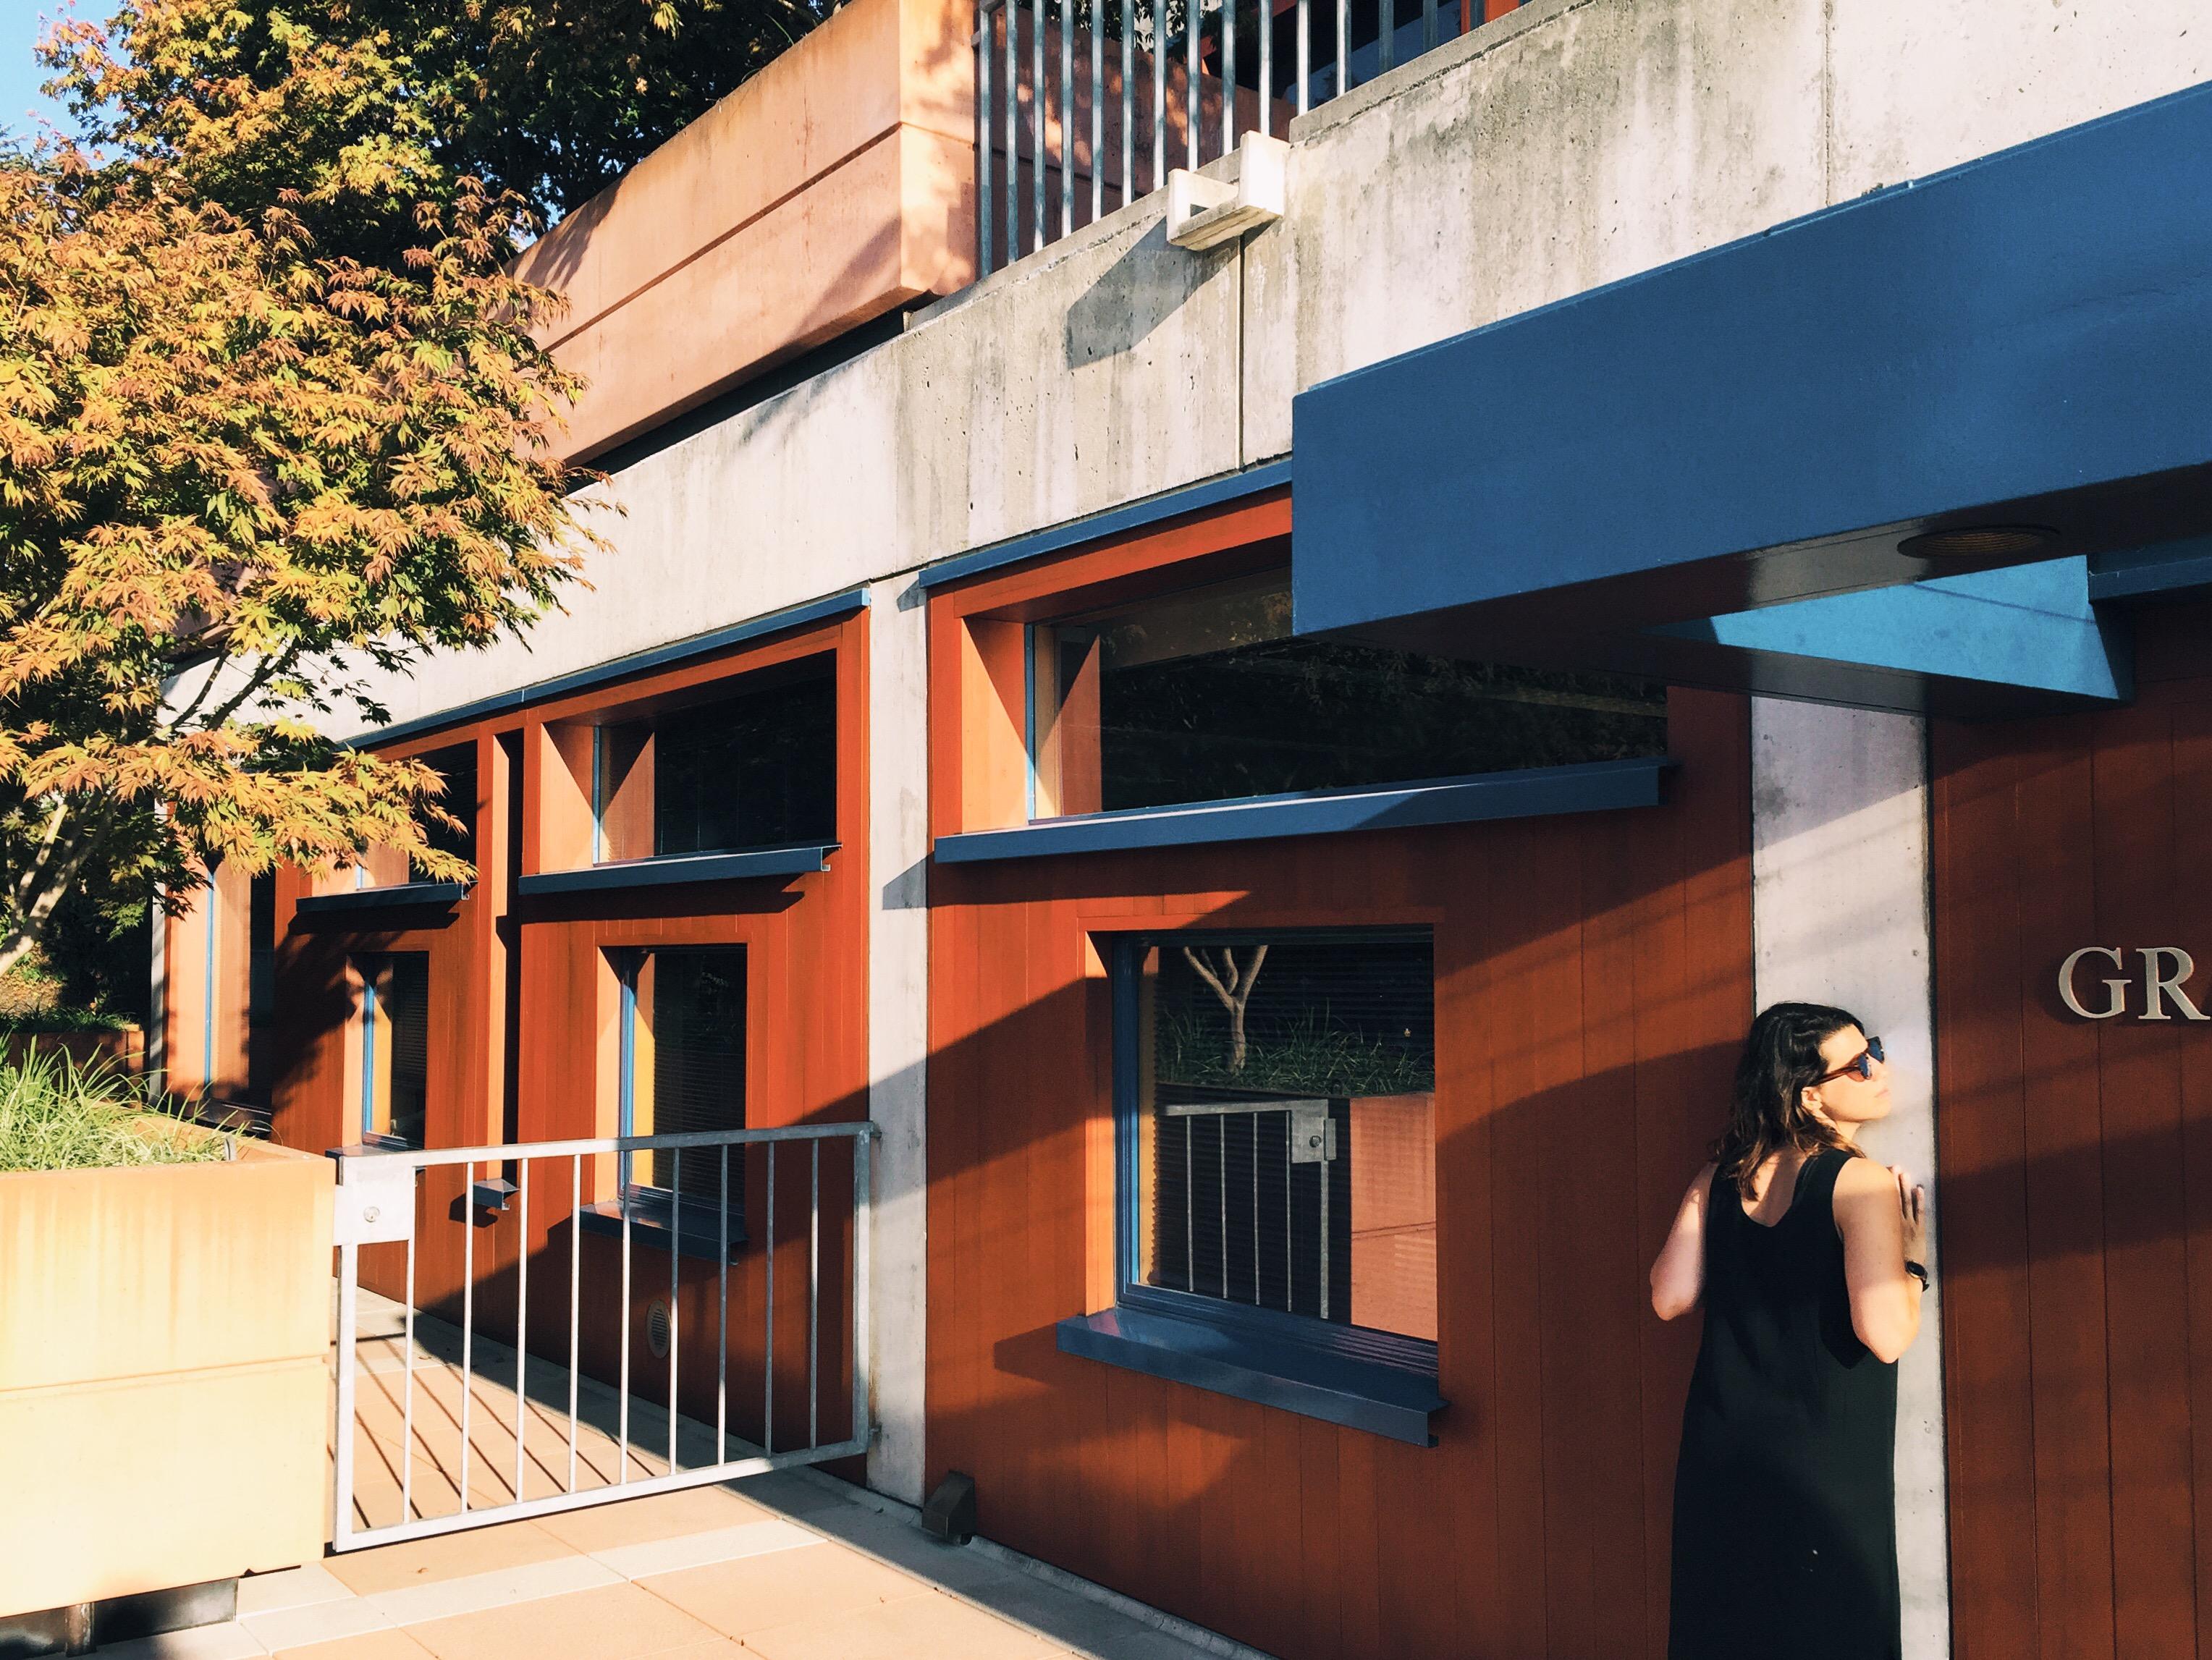 Flora Lamson Hewlett Library at UC Berkeley, designed by Louis Kahn